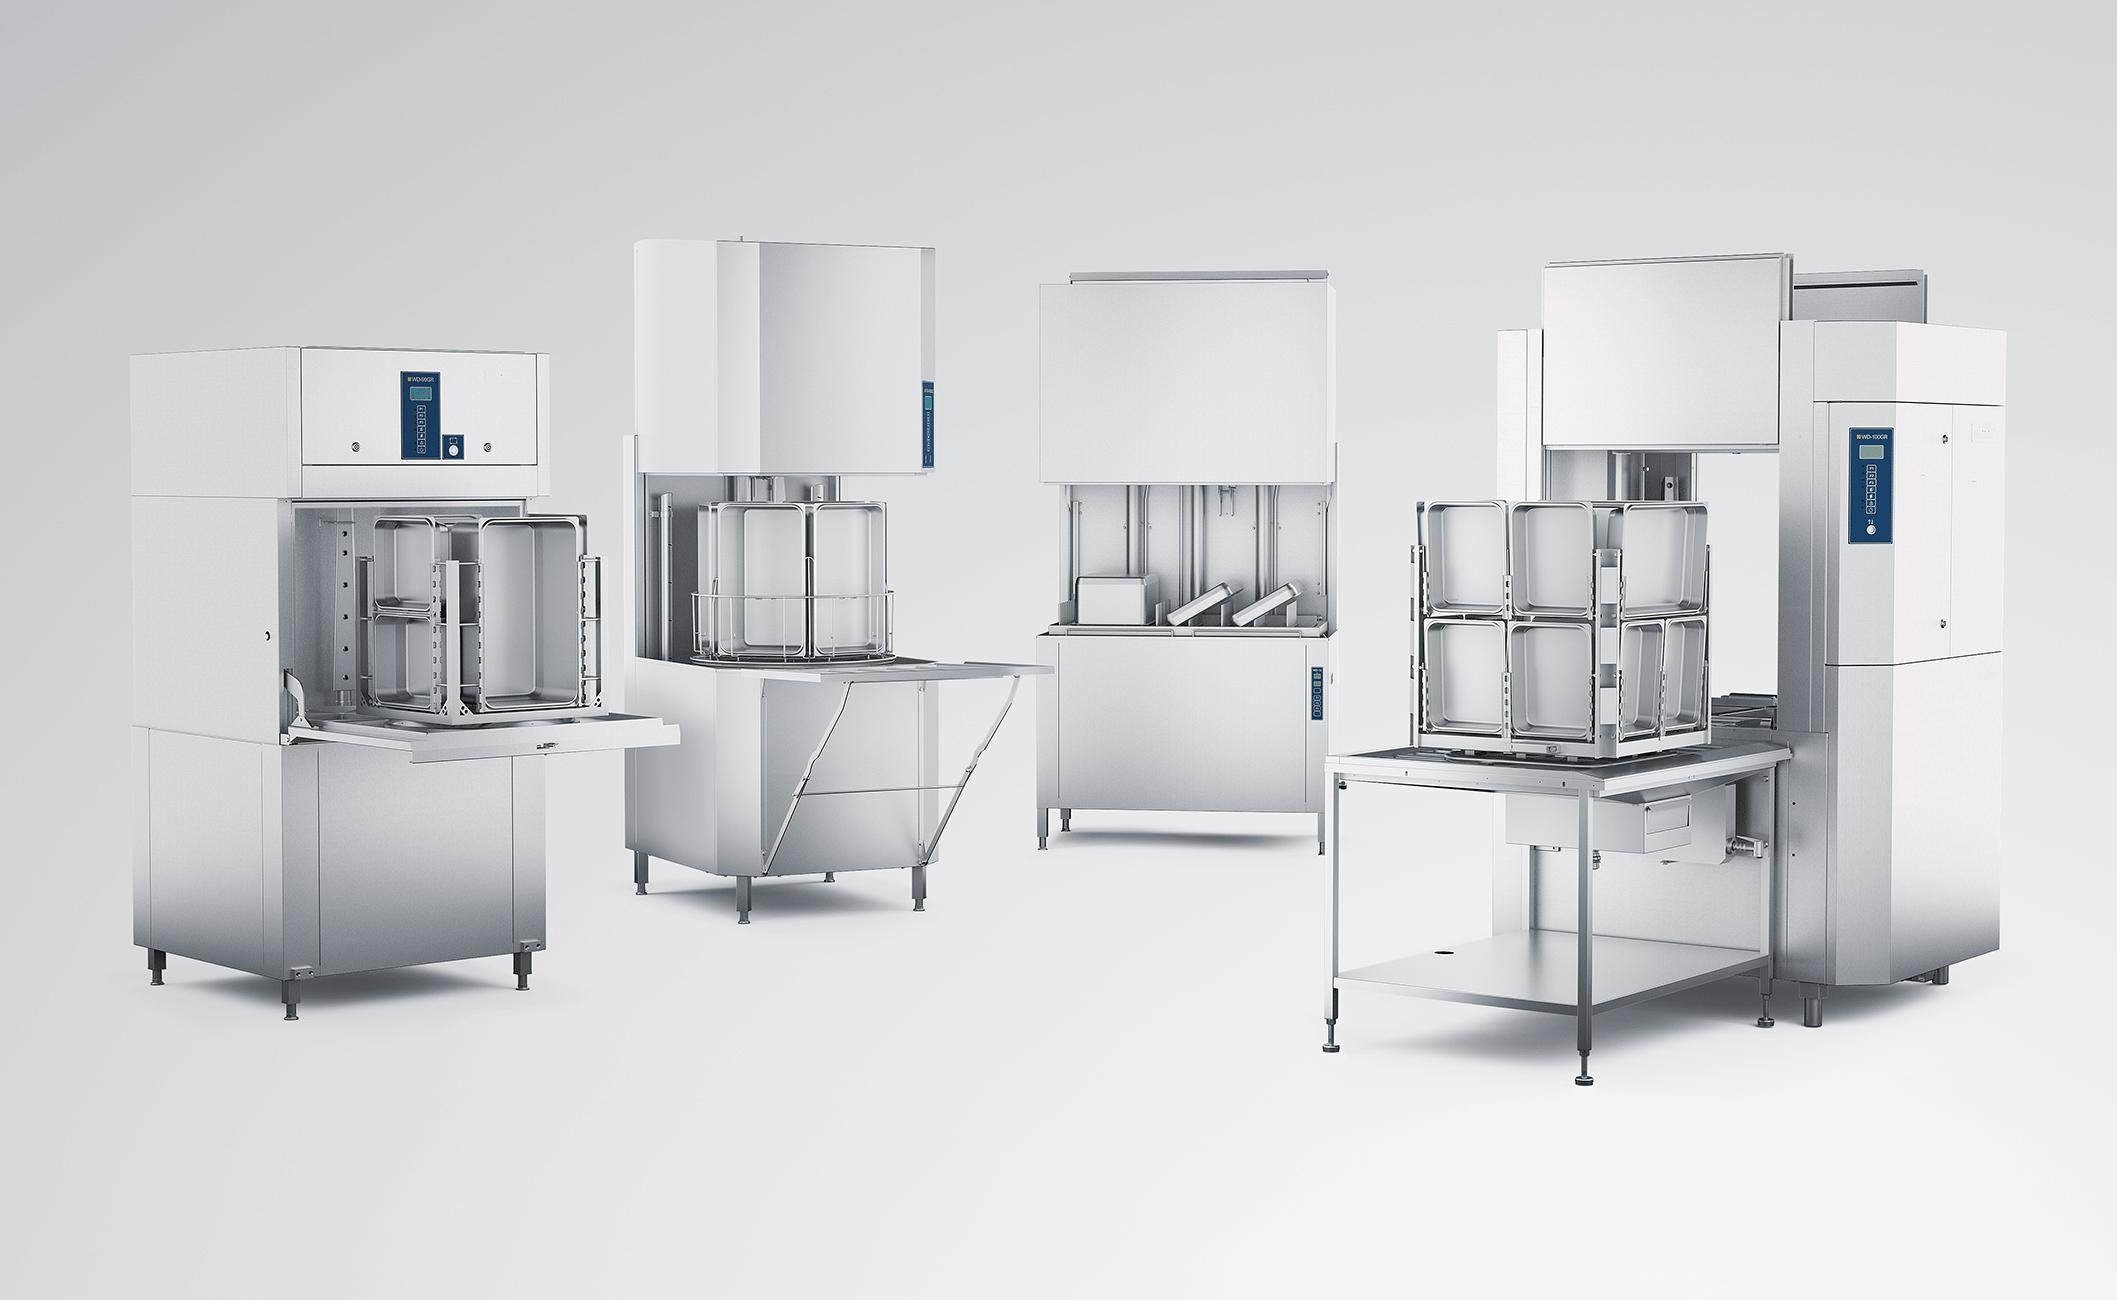 fyra tvättmaskiner ur wexiödisks sortiment